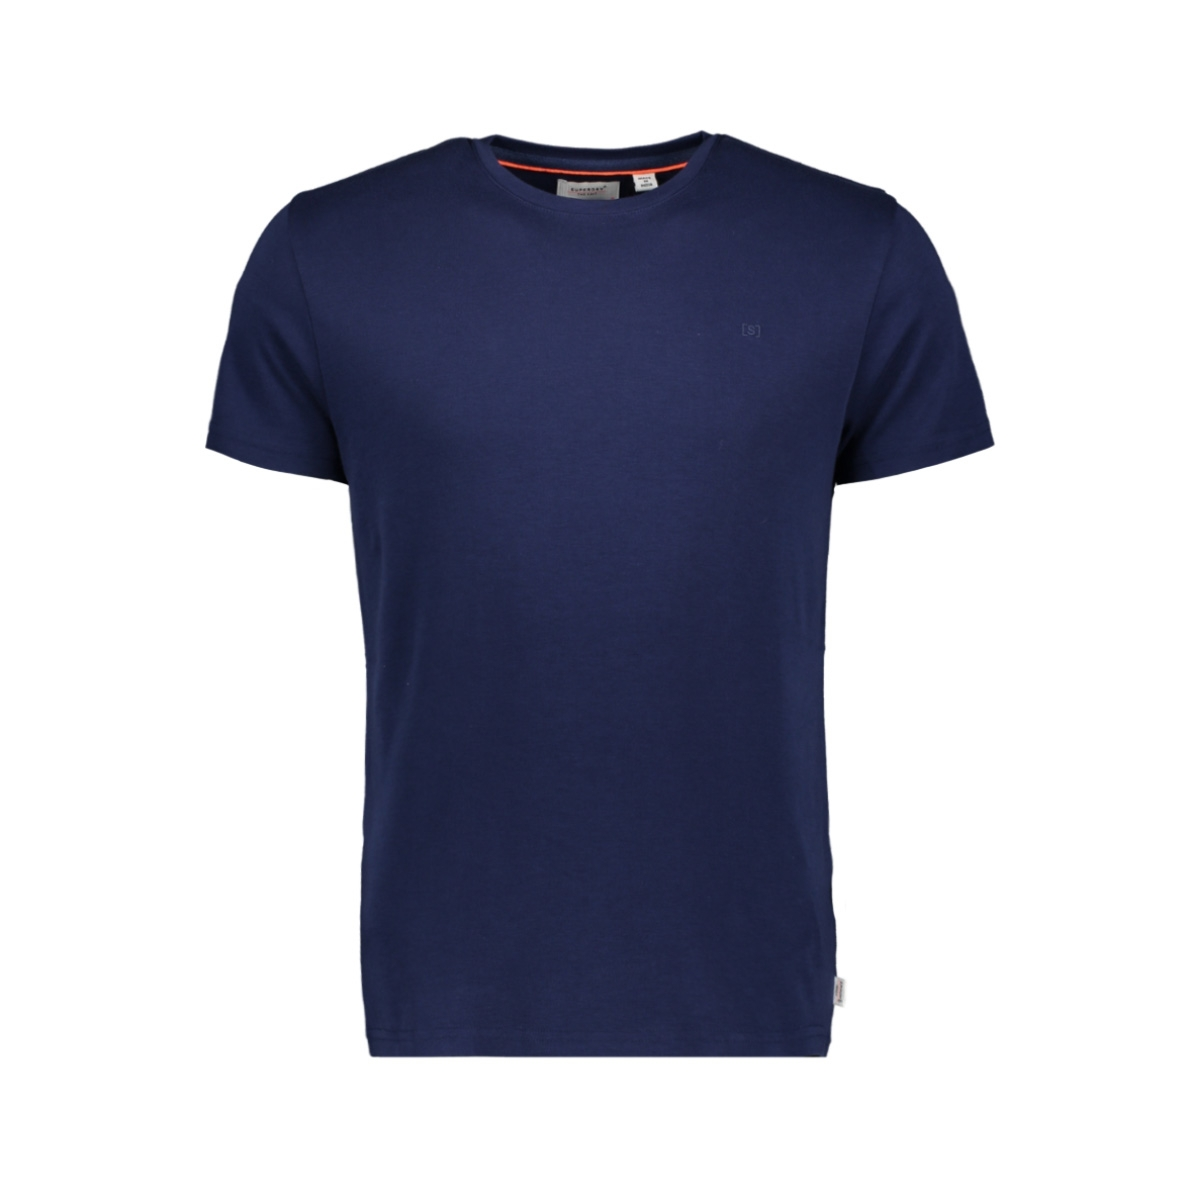 edit jersey tee m1000044a superdry t-shirt abyss  navy